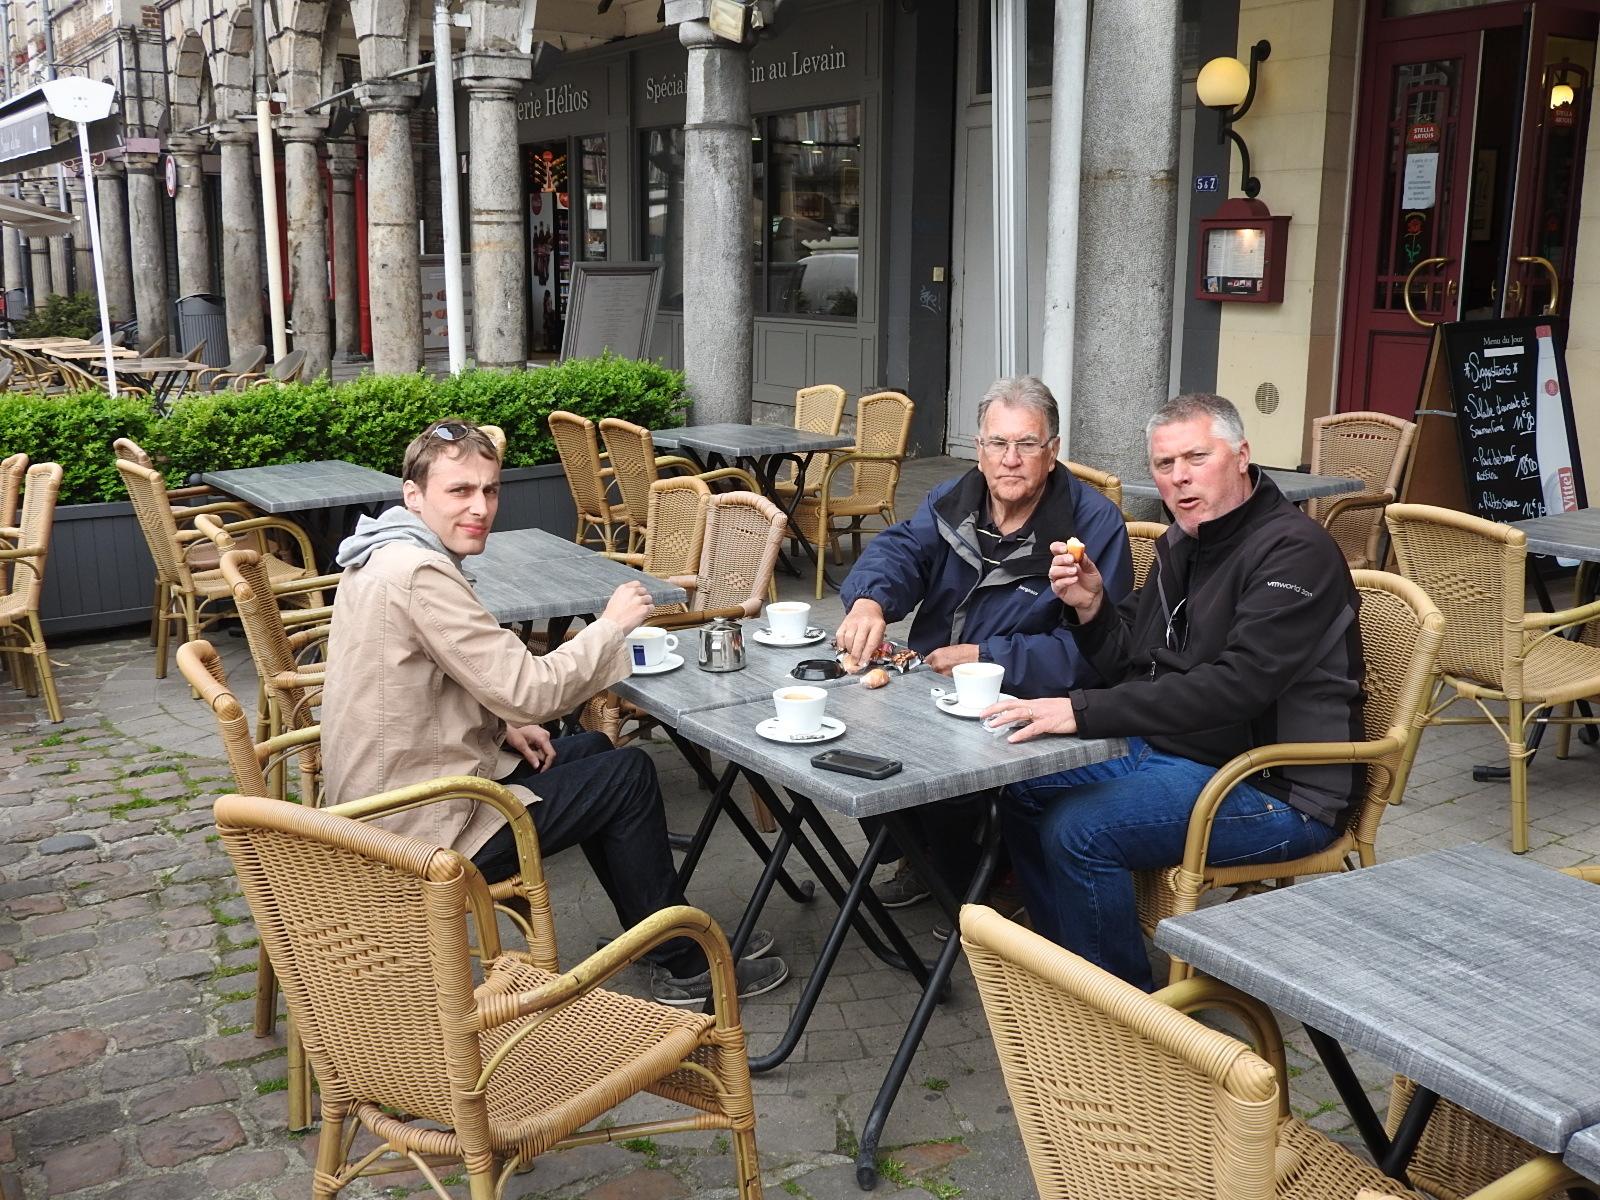 Morning Coffee in Arras